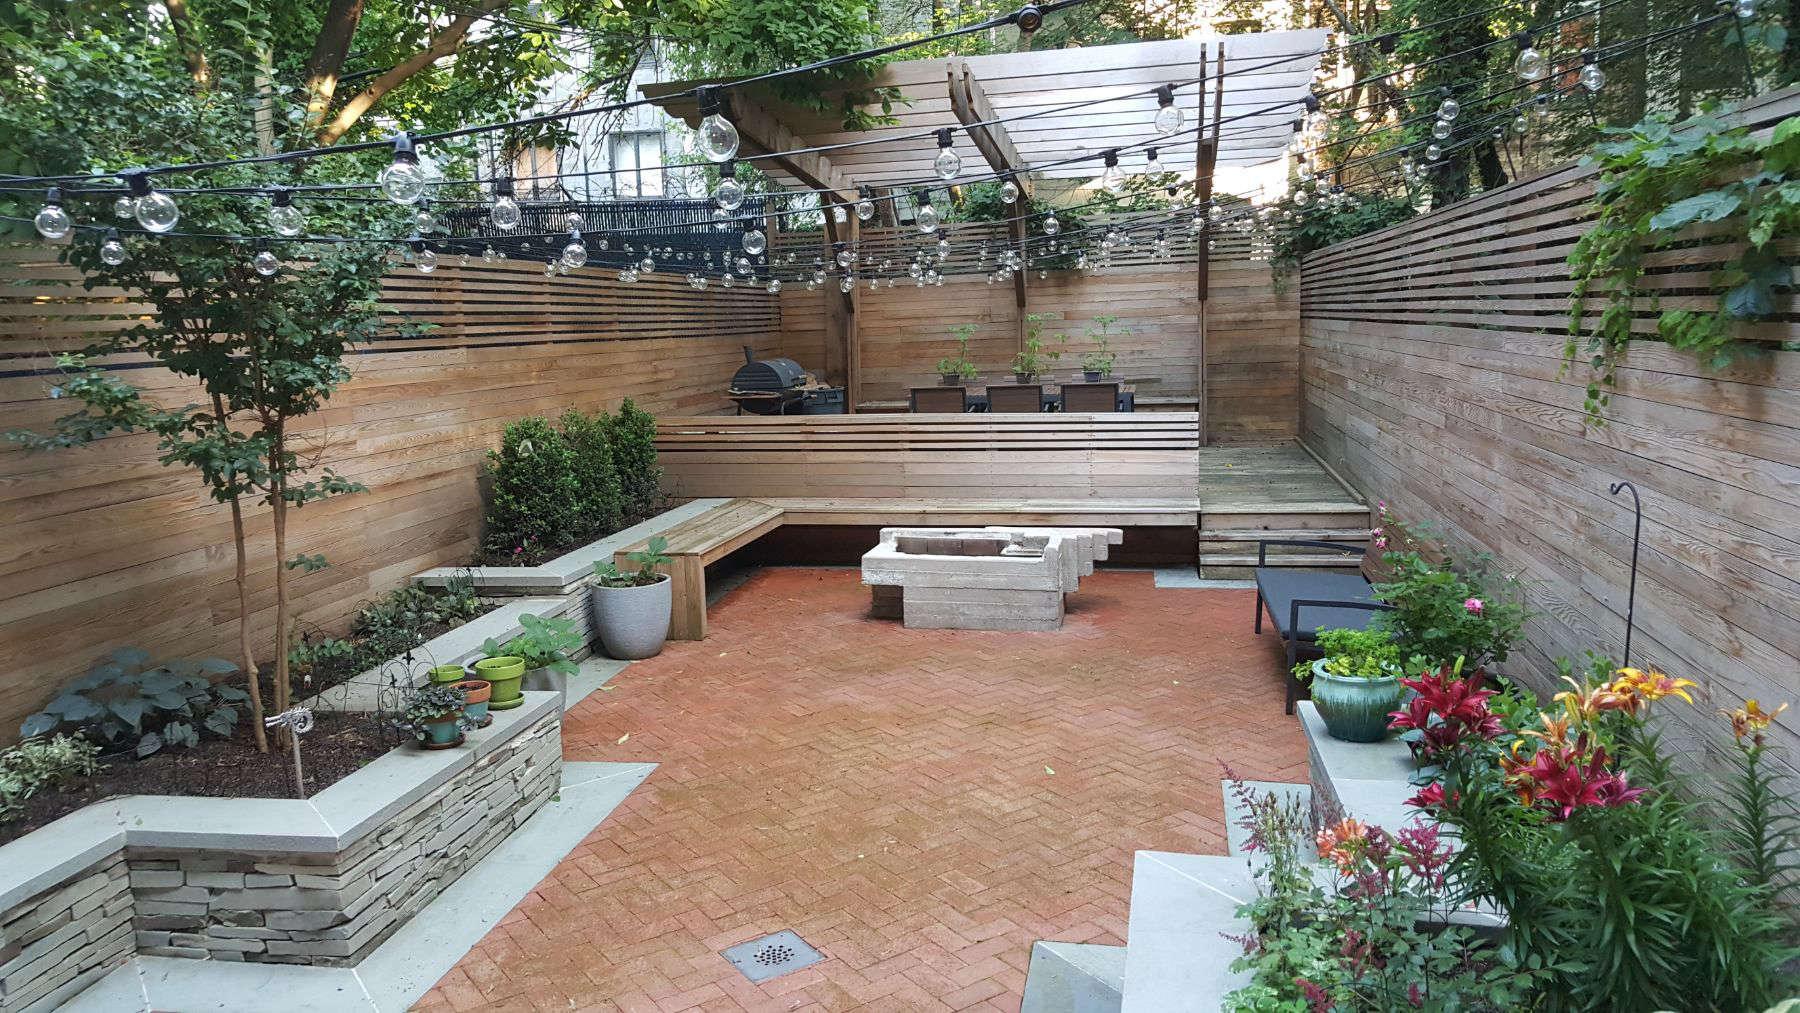 418 Quincy Street Backyard - Hardscape - Gardenista on Backyard Hardscape Design id=58585